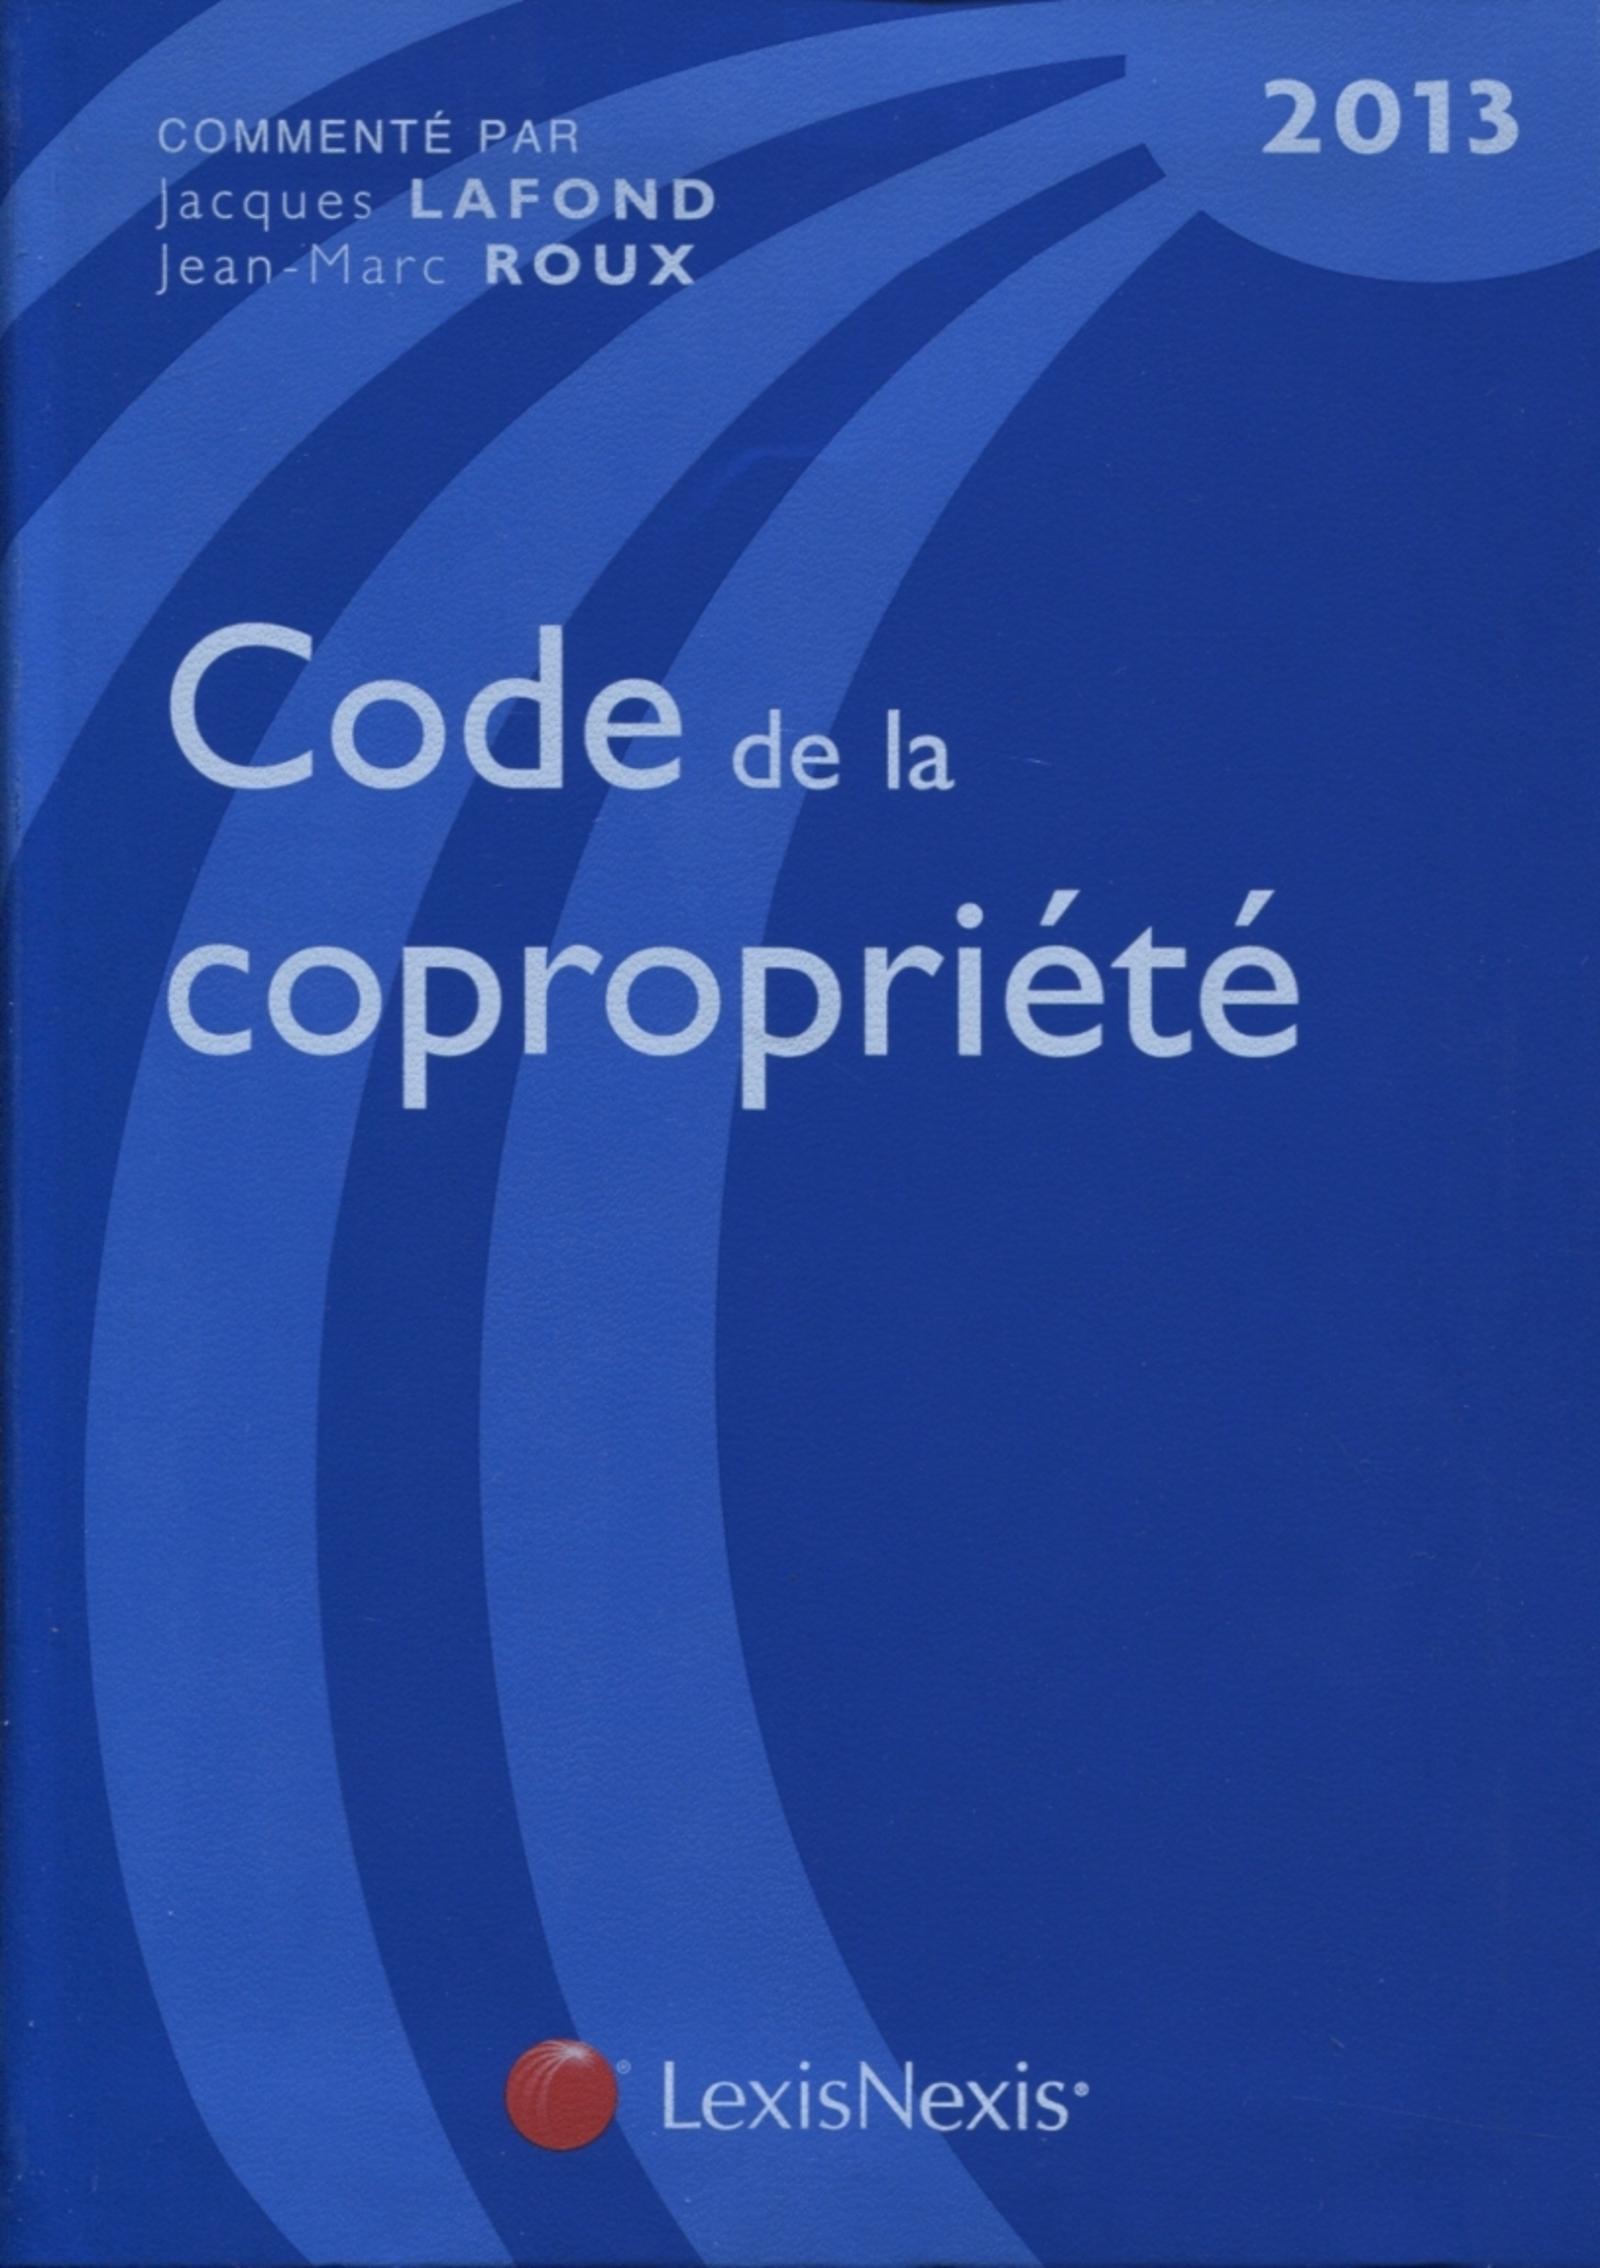 CODE DE LA COPROPRIETE 2013